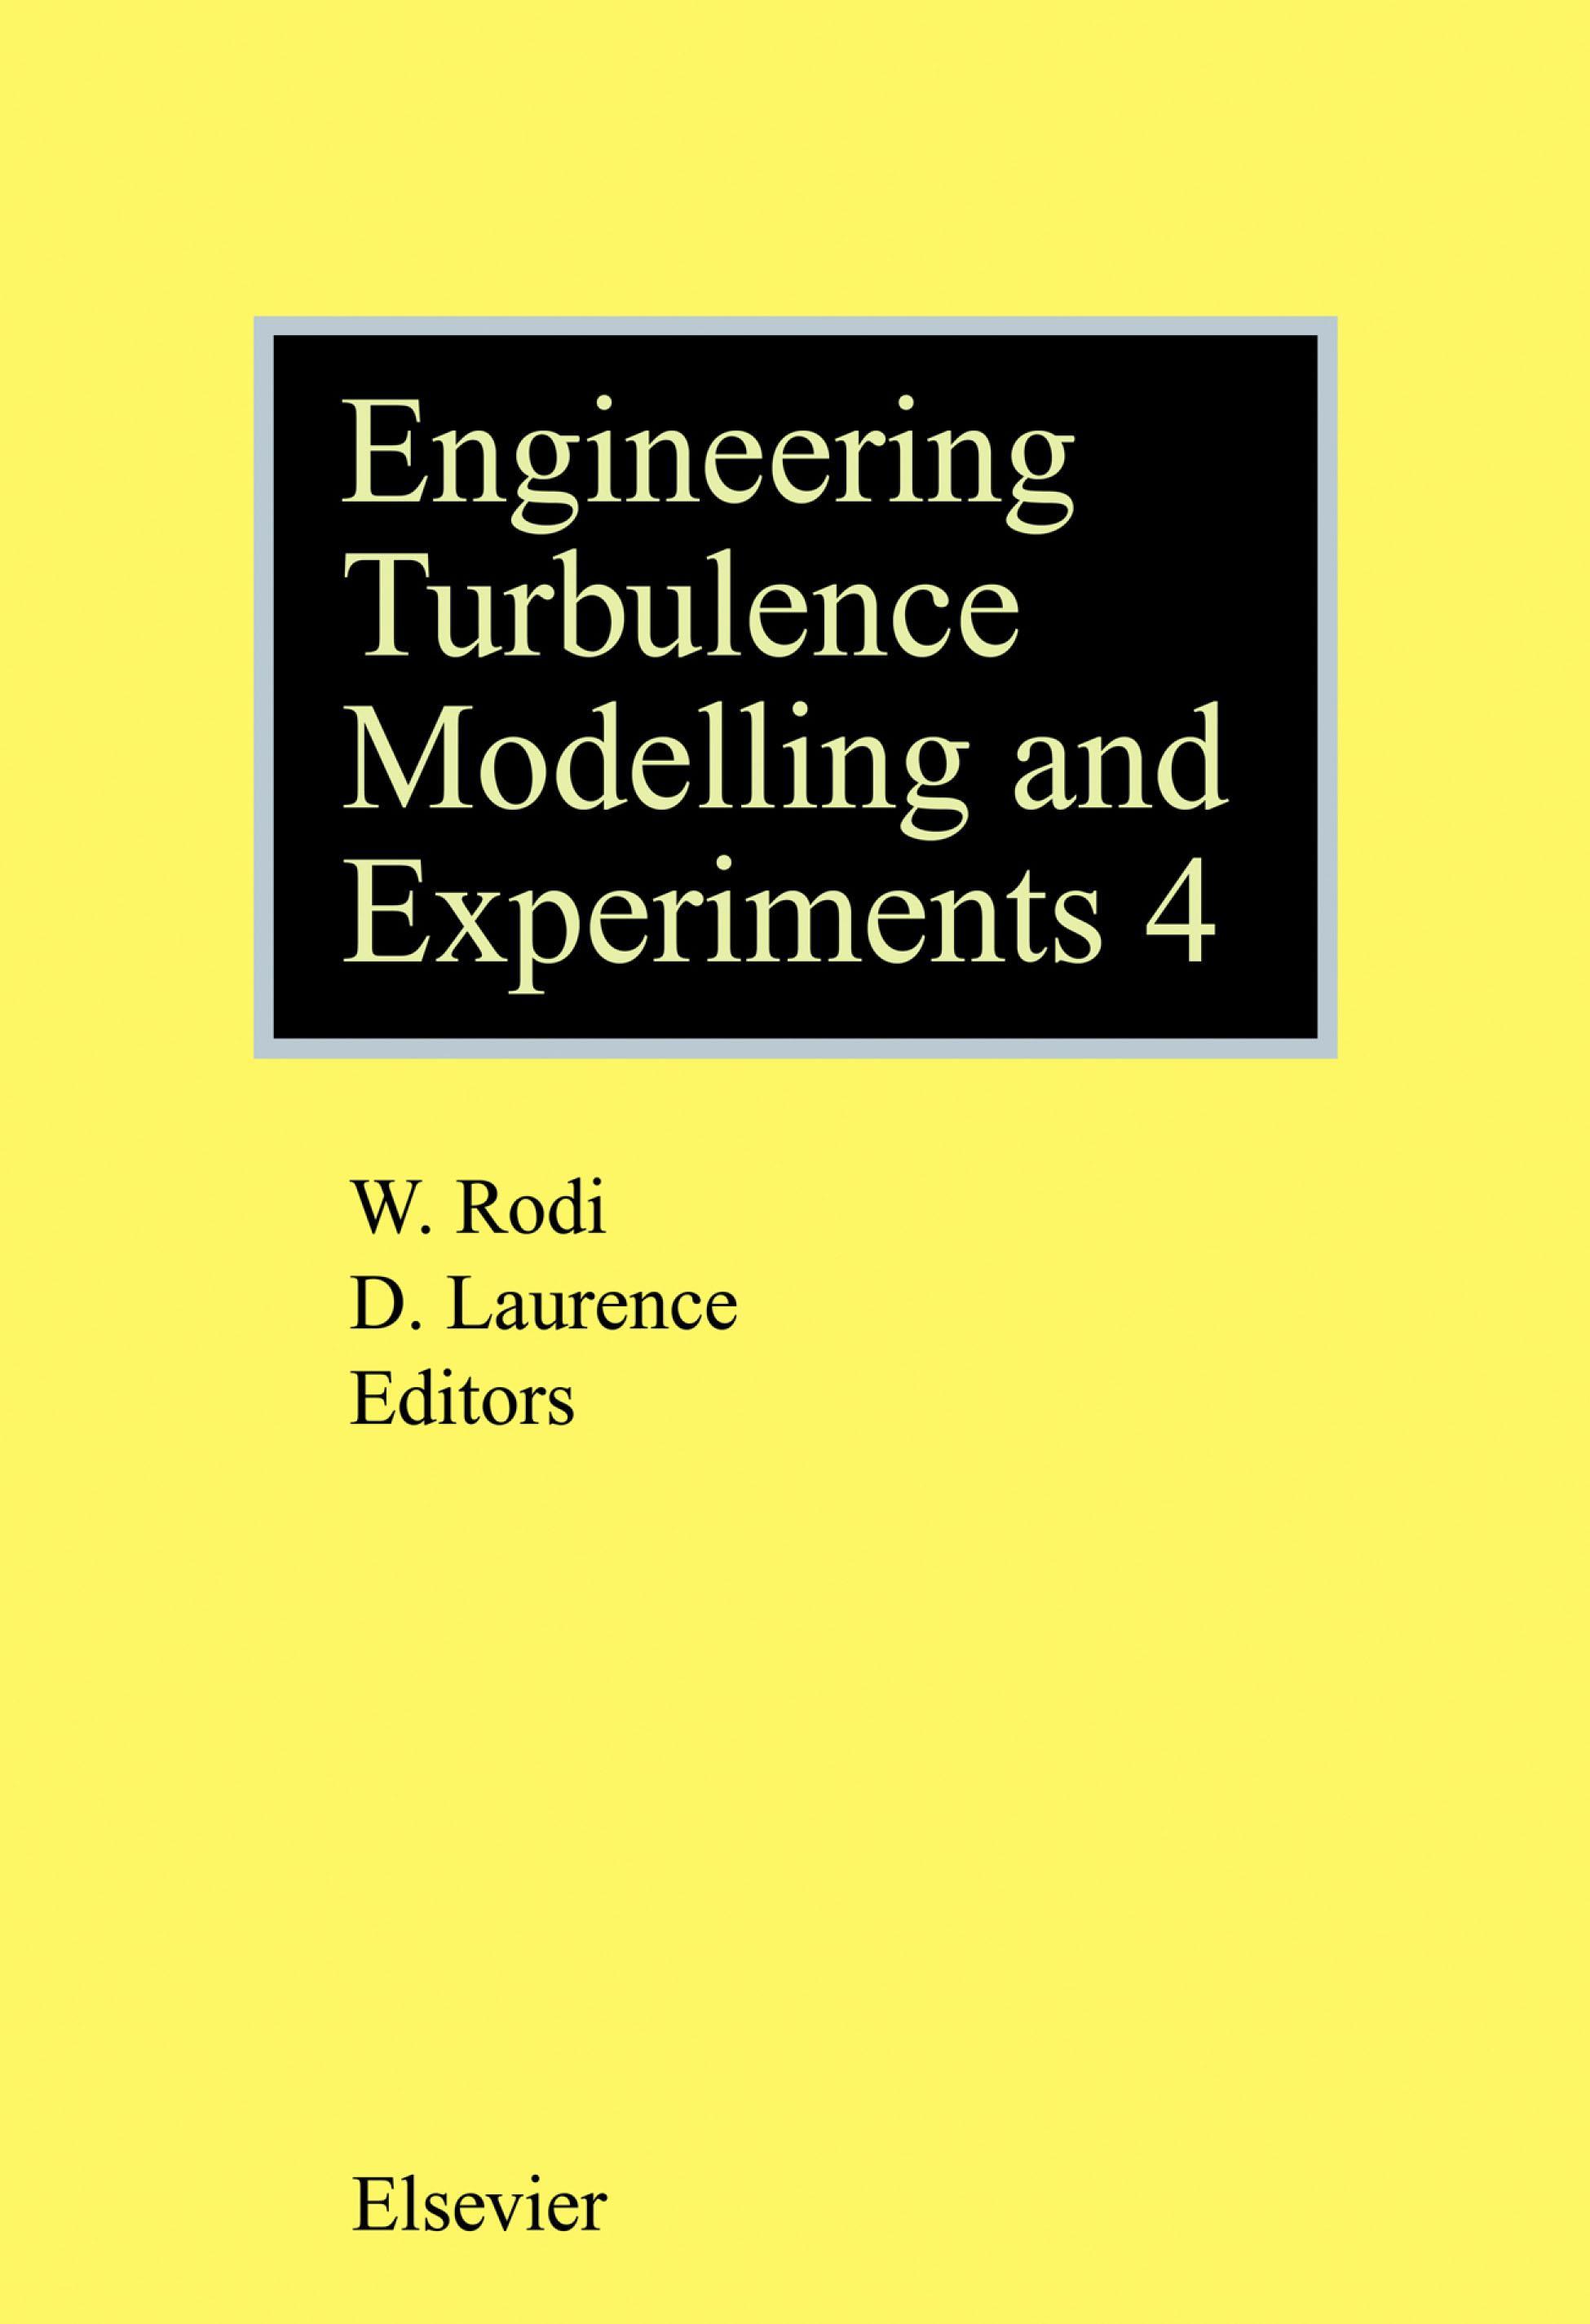 Engineering Turbulence Modelling and Experiments - 4 EB9780080530987